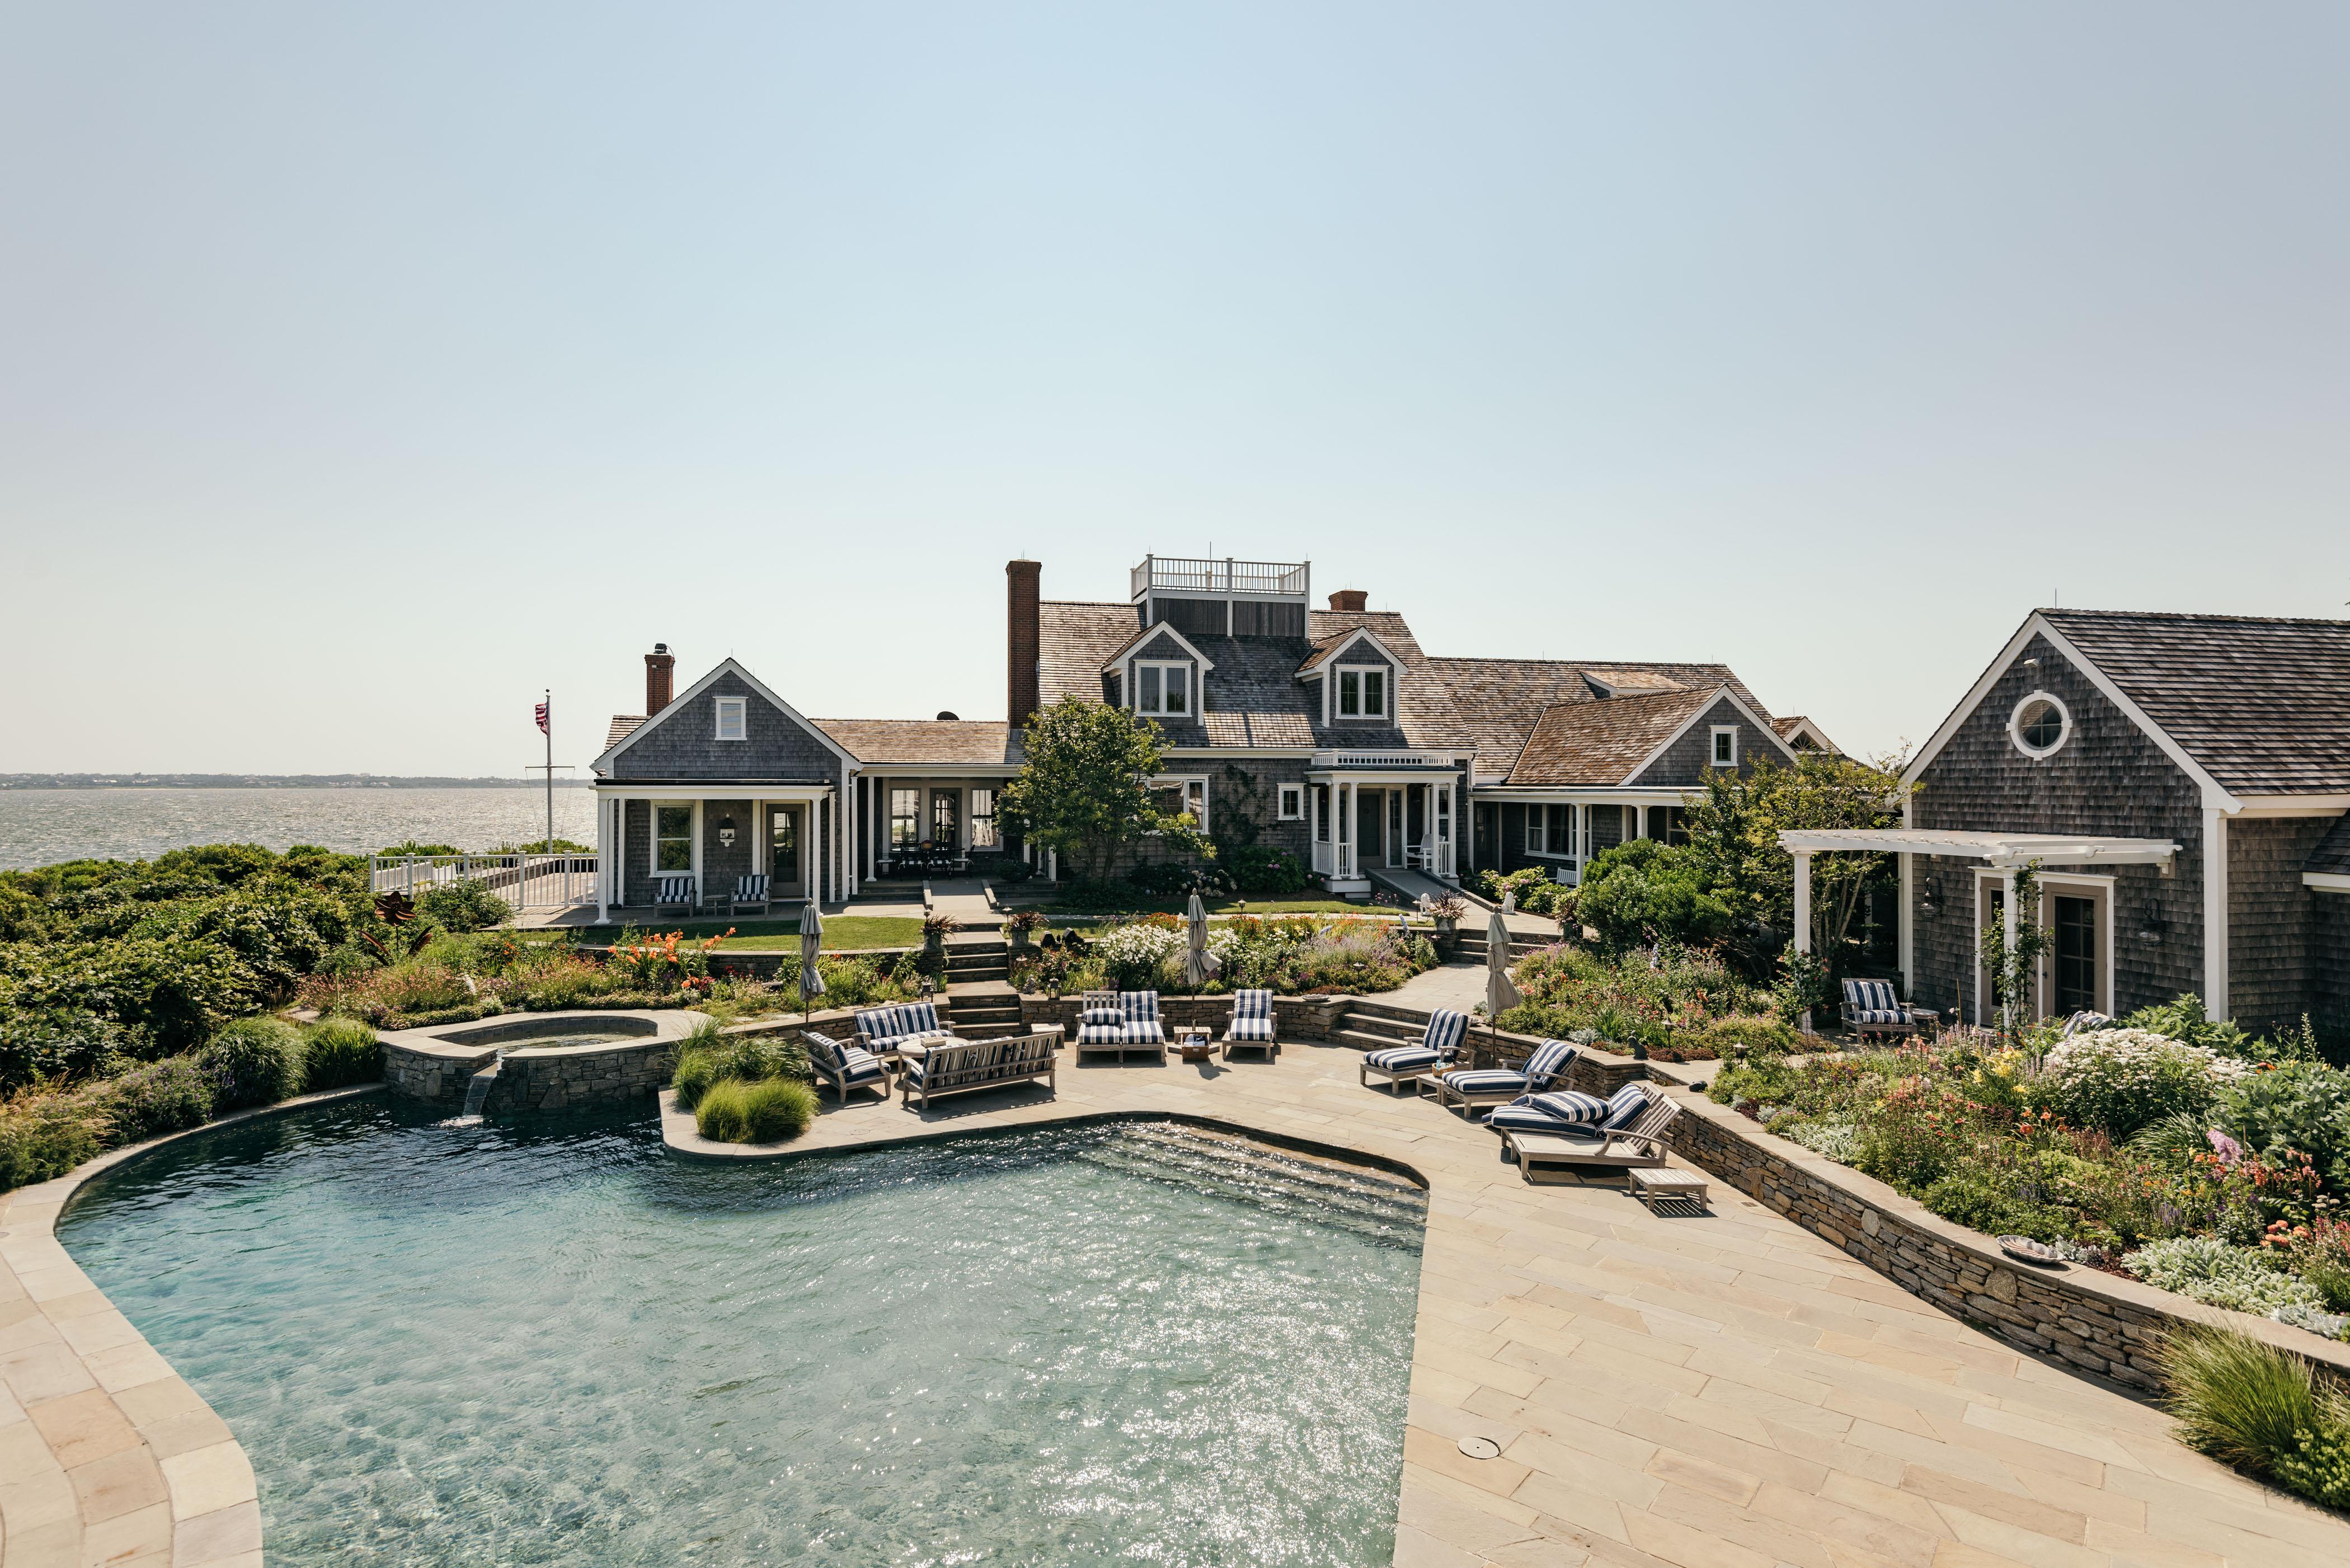 Kourtney Kardashian's Nantucket Airbnb Home